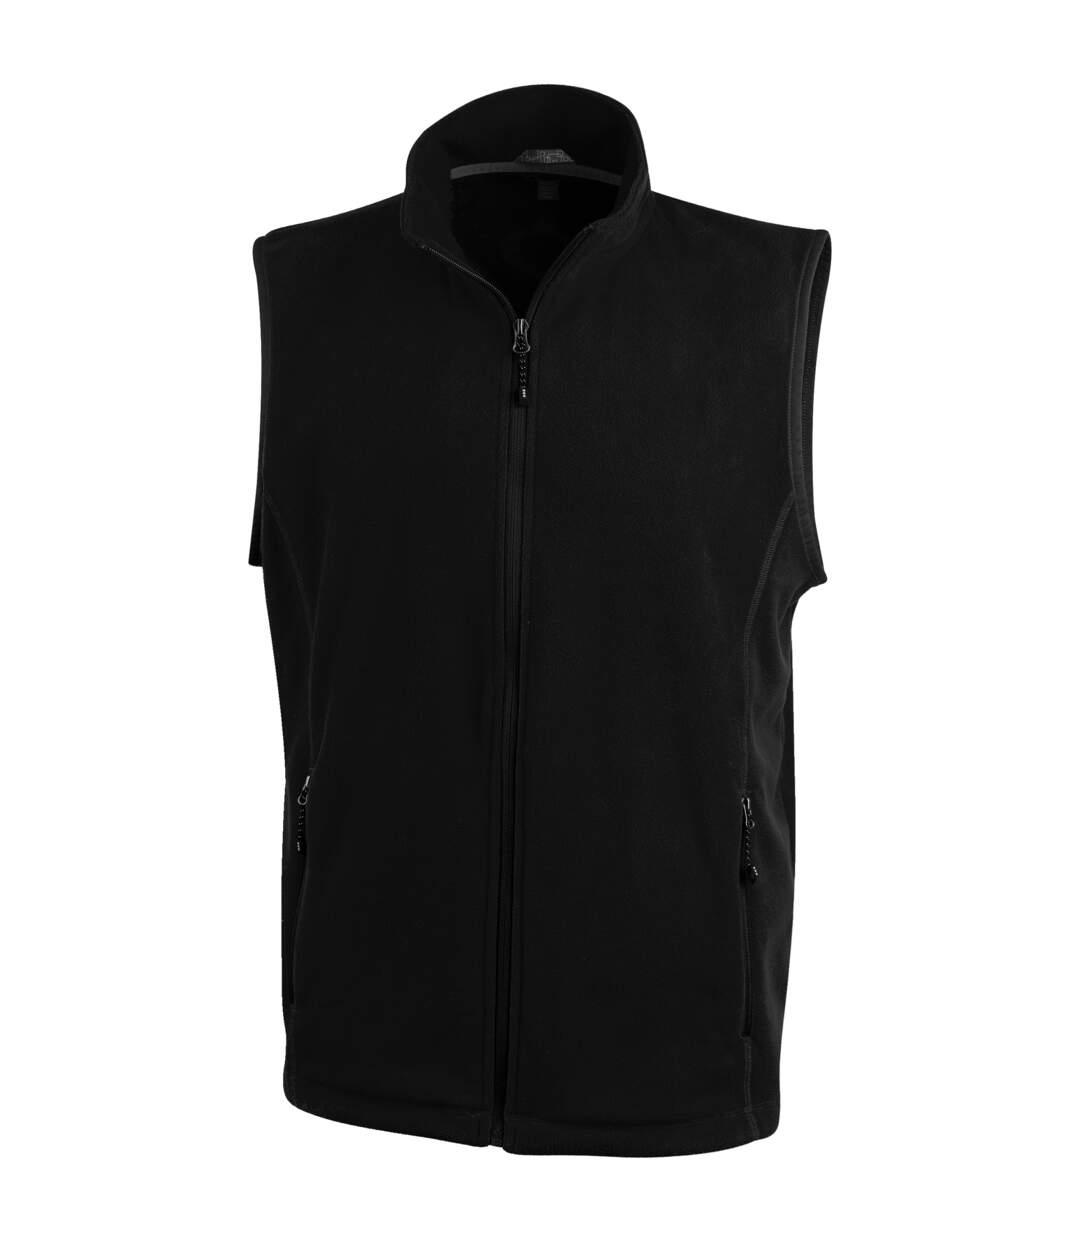 Elevate Mens Tyndall Micro Fleece Bodywarmer (Solid Black) - UTPF1936